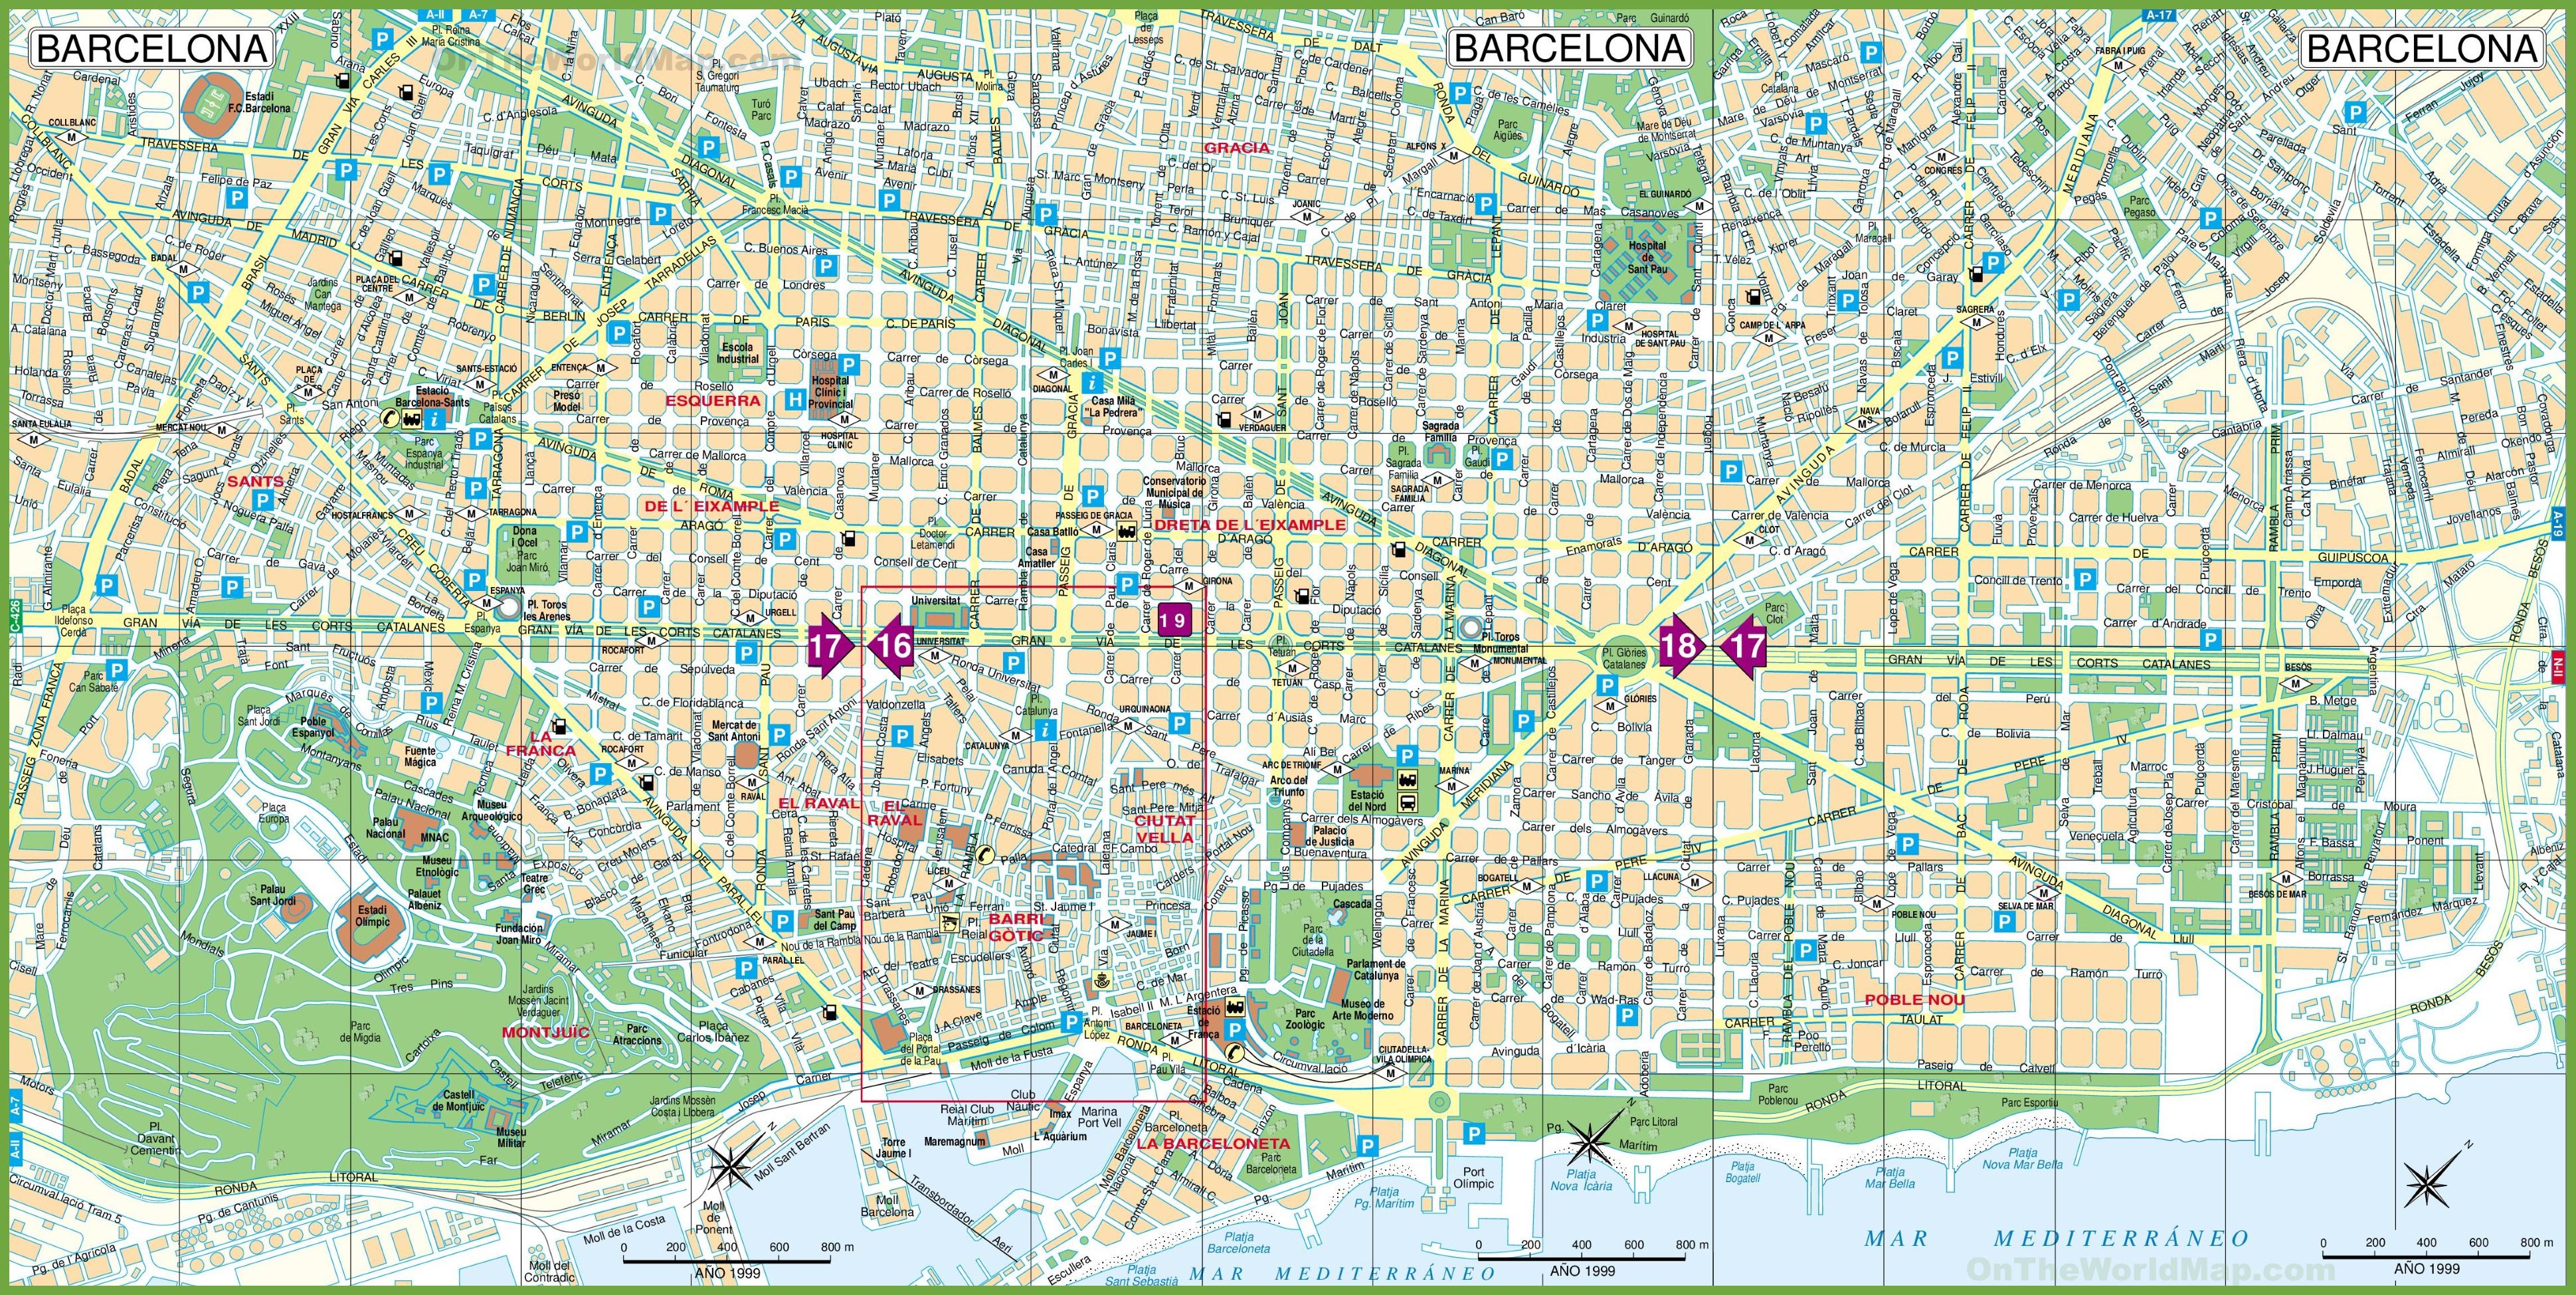 Printable City Street Maps | Printable Maps - Printable Street Maps Free